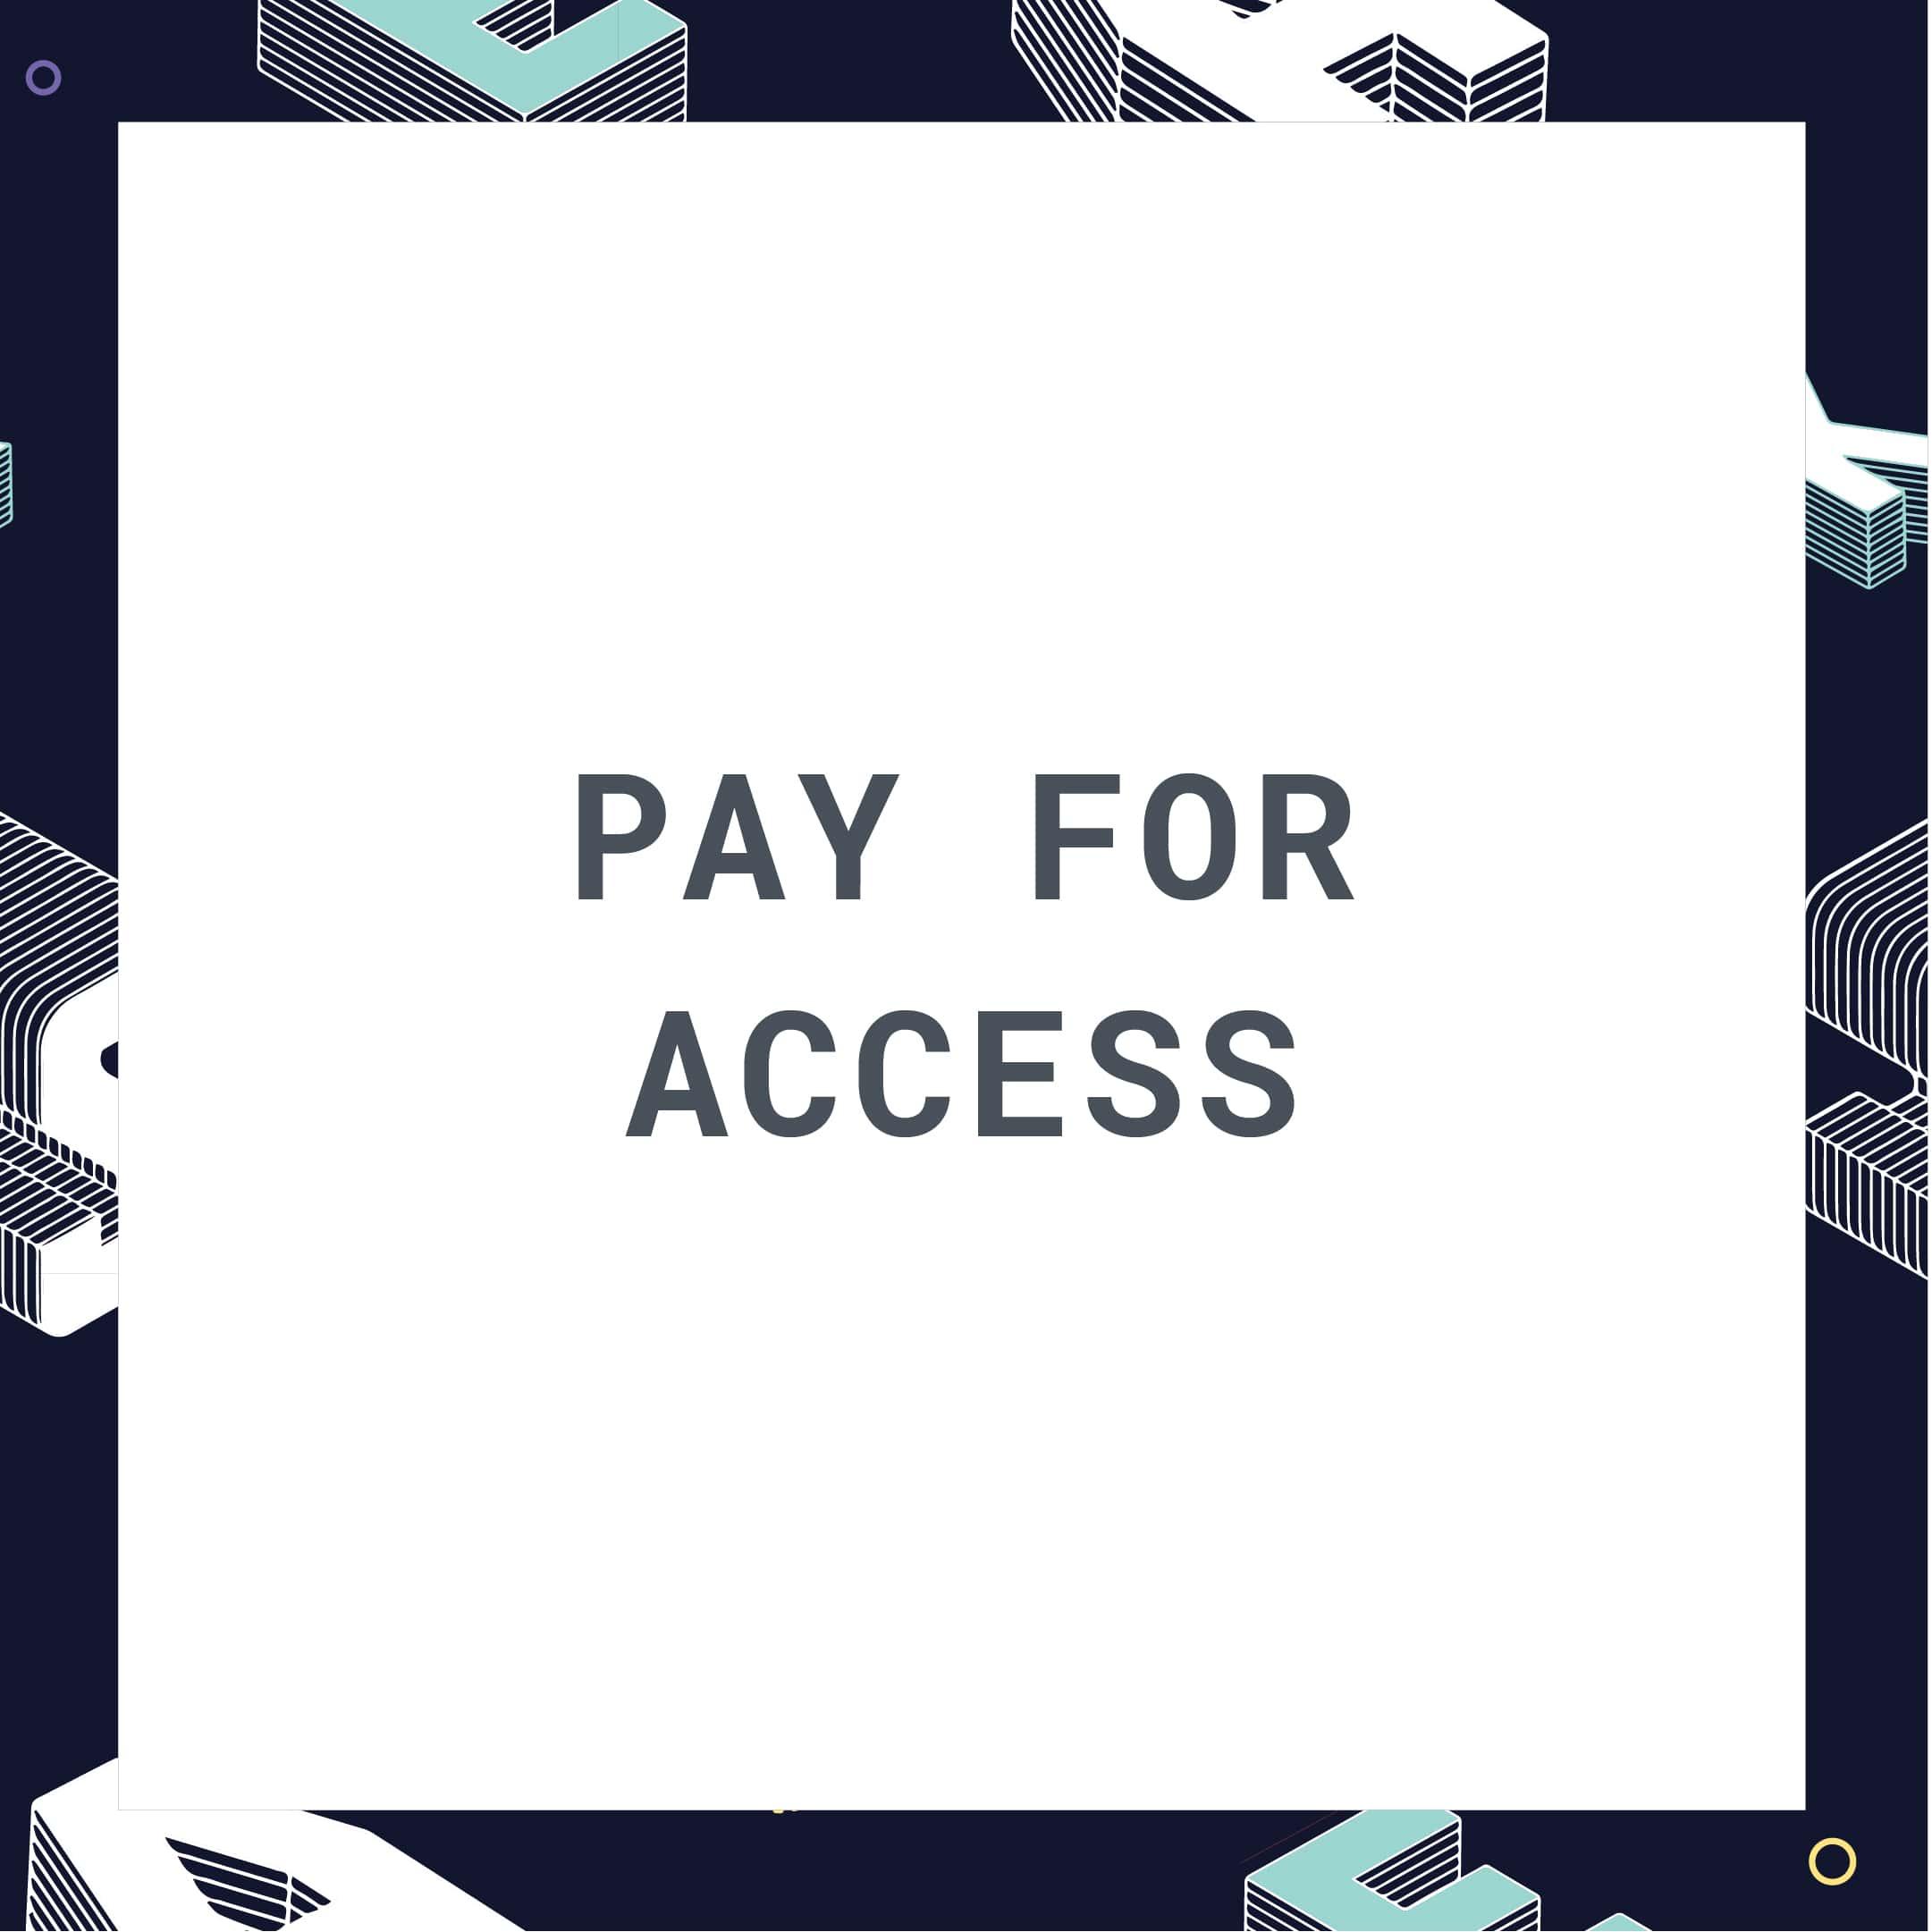 pay for access-min.jpg